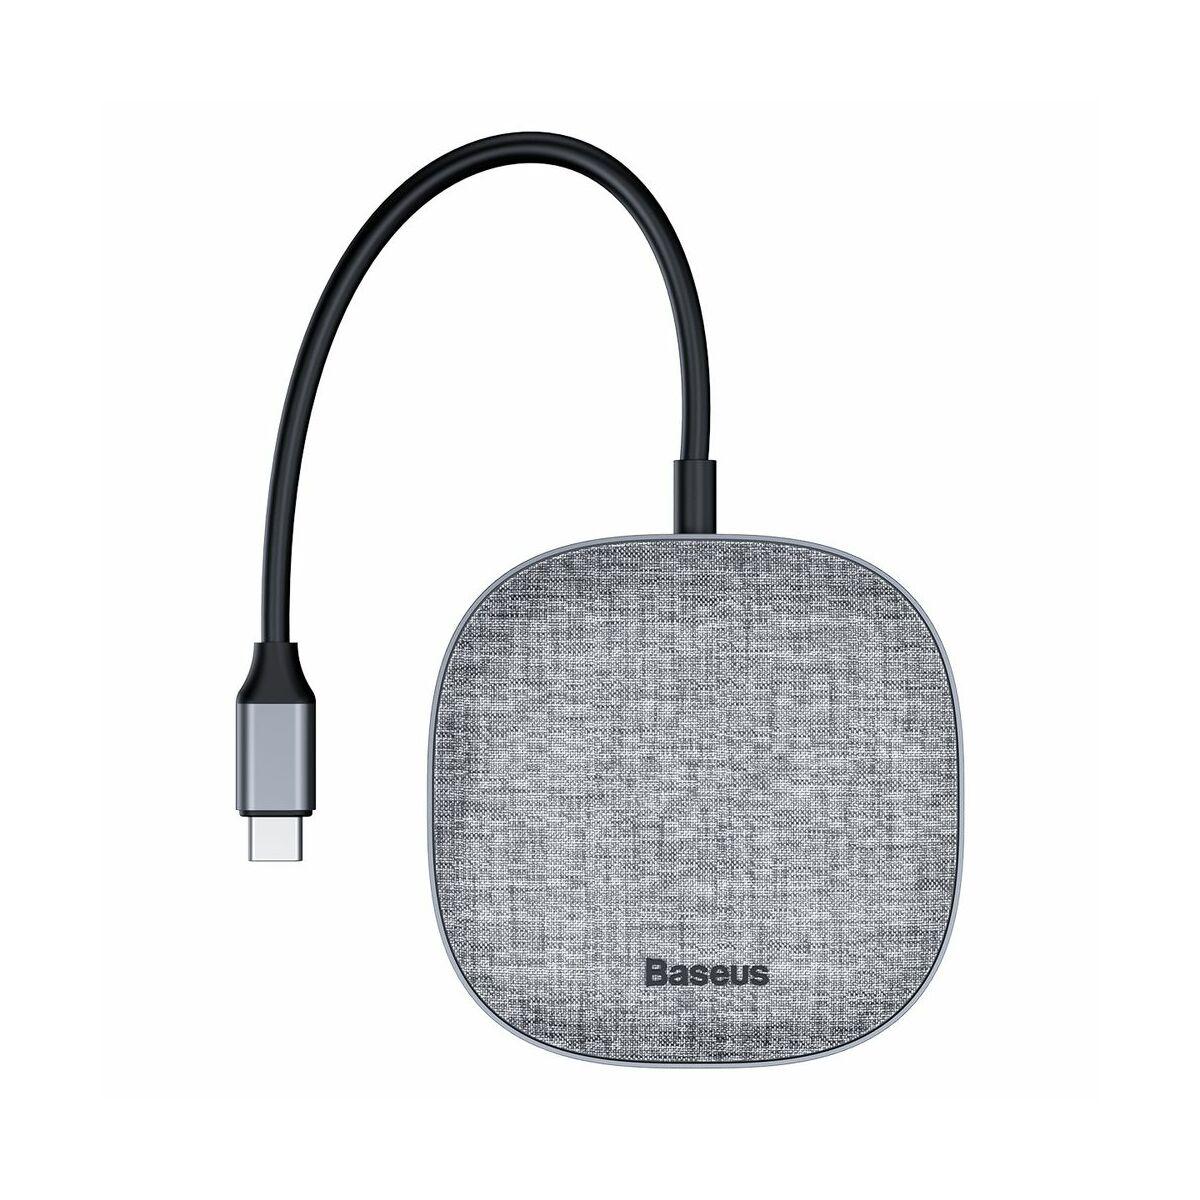 Baseus HUB Fabric Series 7-in-1 (Type-C bemenetről -  2x USB3.0 + 4K HDMI + RJ45 + Micro SD) sötét szürke (CAHUB-DX0G)